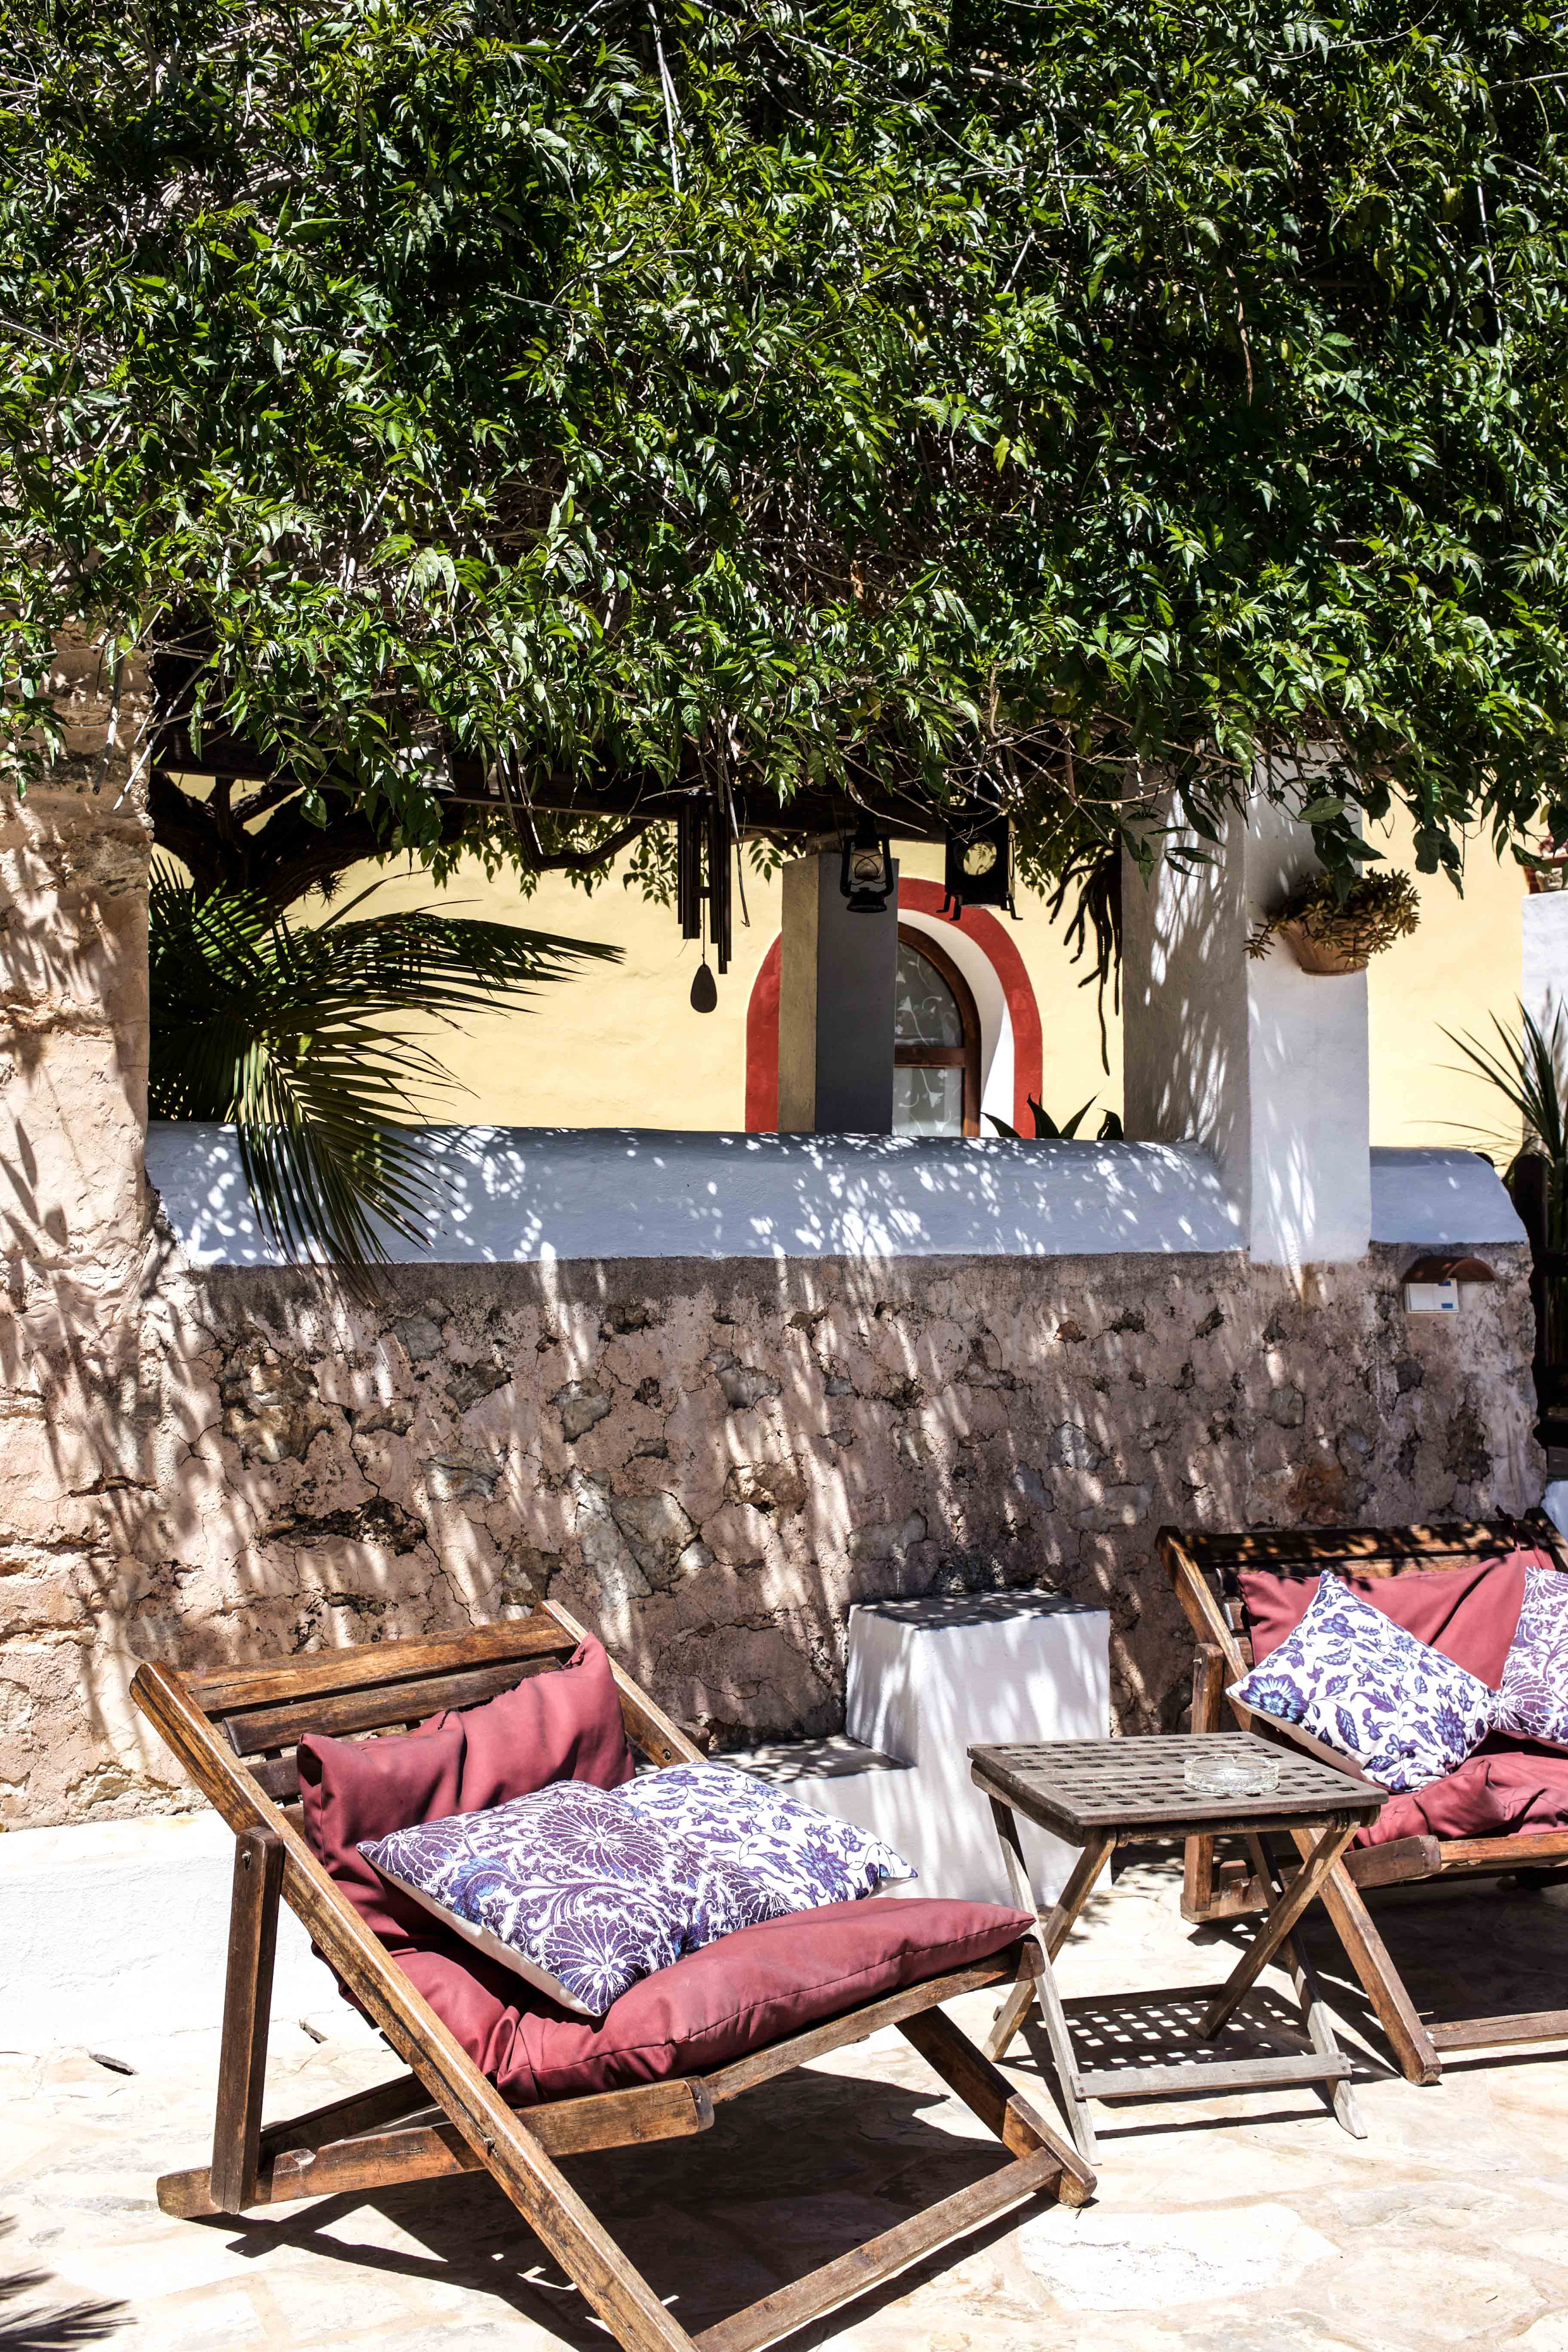 travelblog-reiseblog-ibiza-kurztrip-mädelstrip-luxus-villa_9138